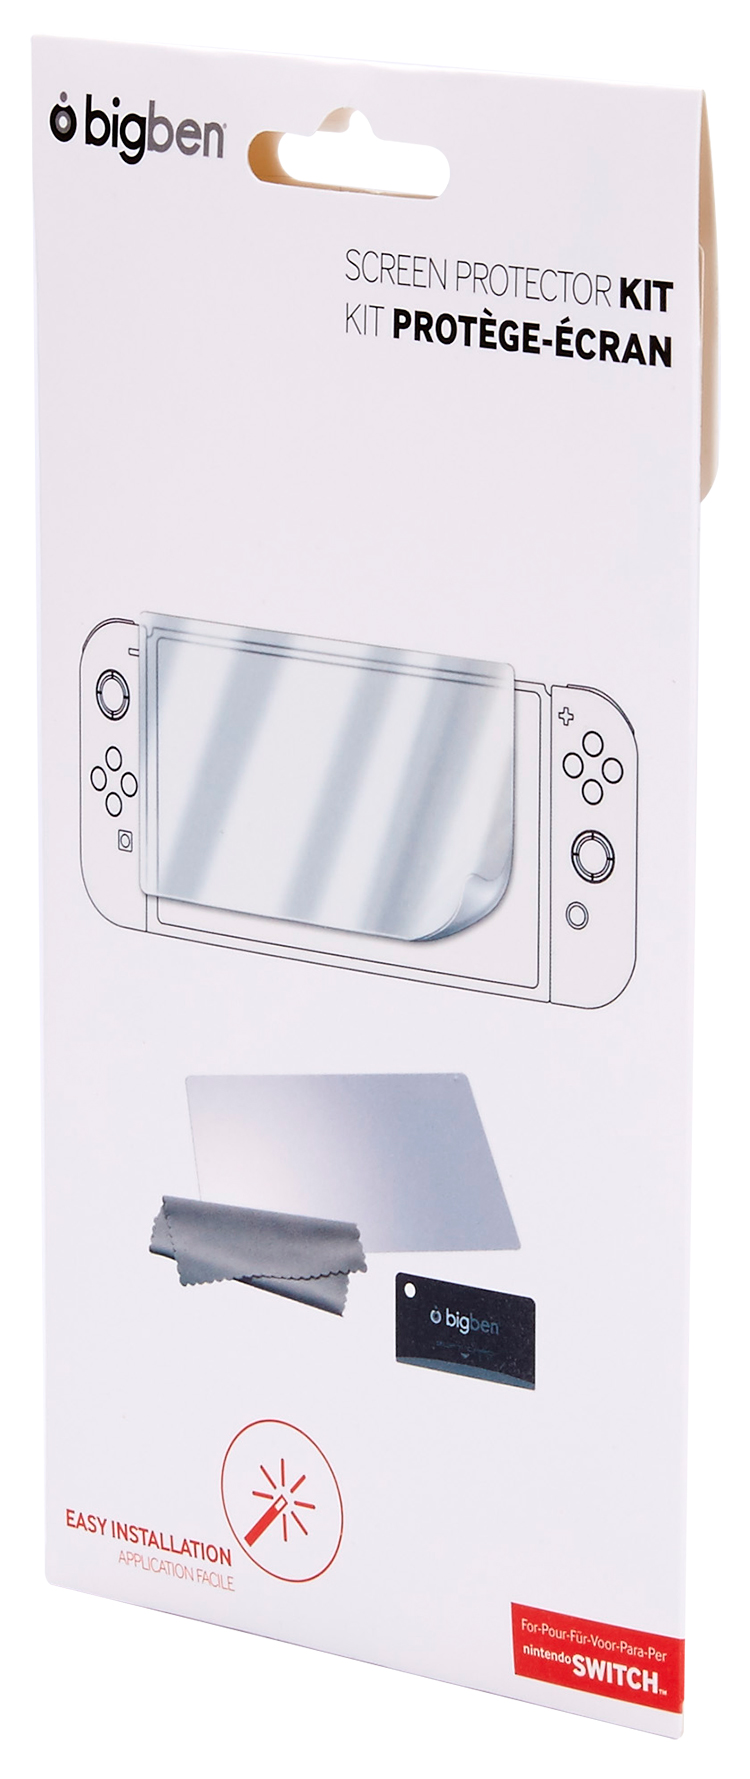 Protection Kit - Bild